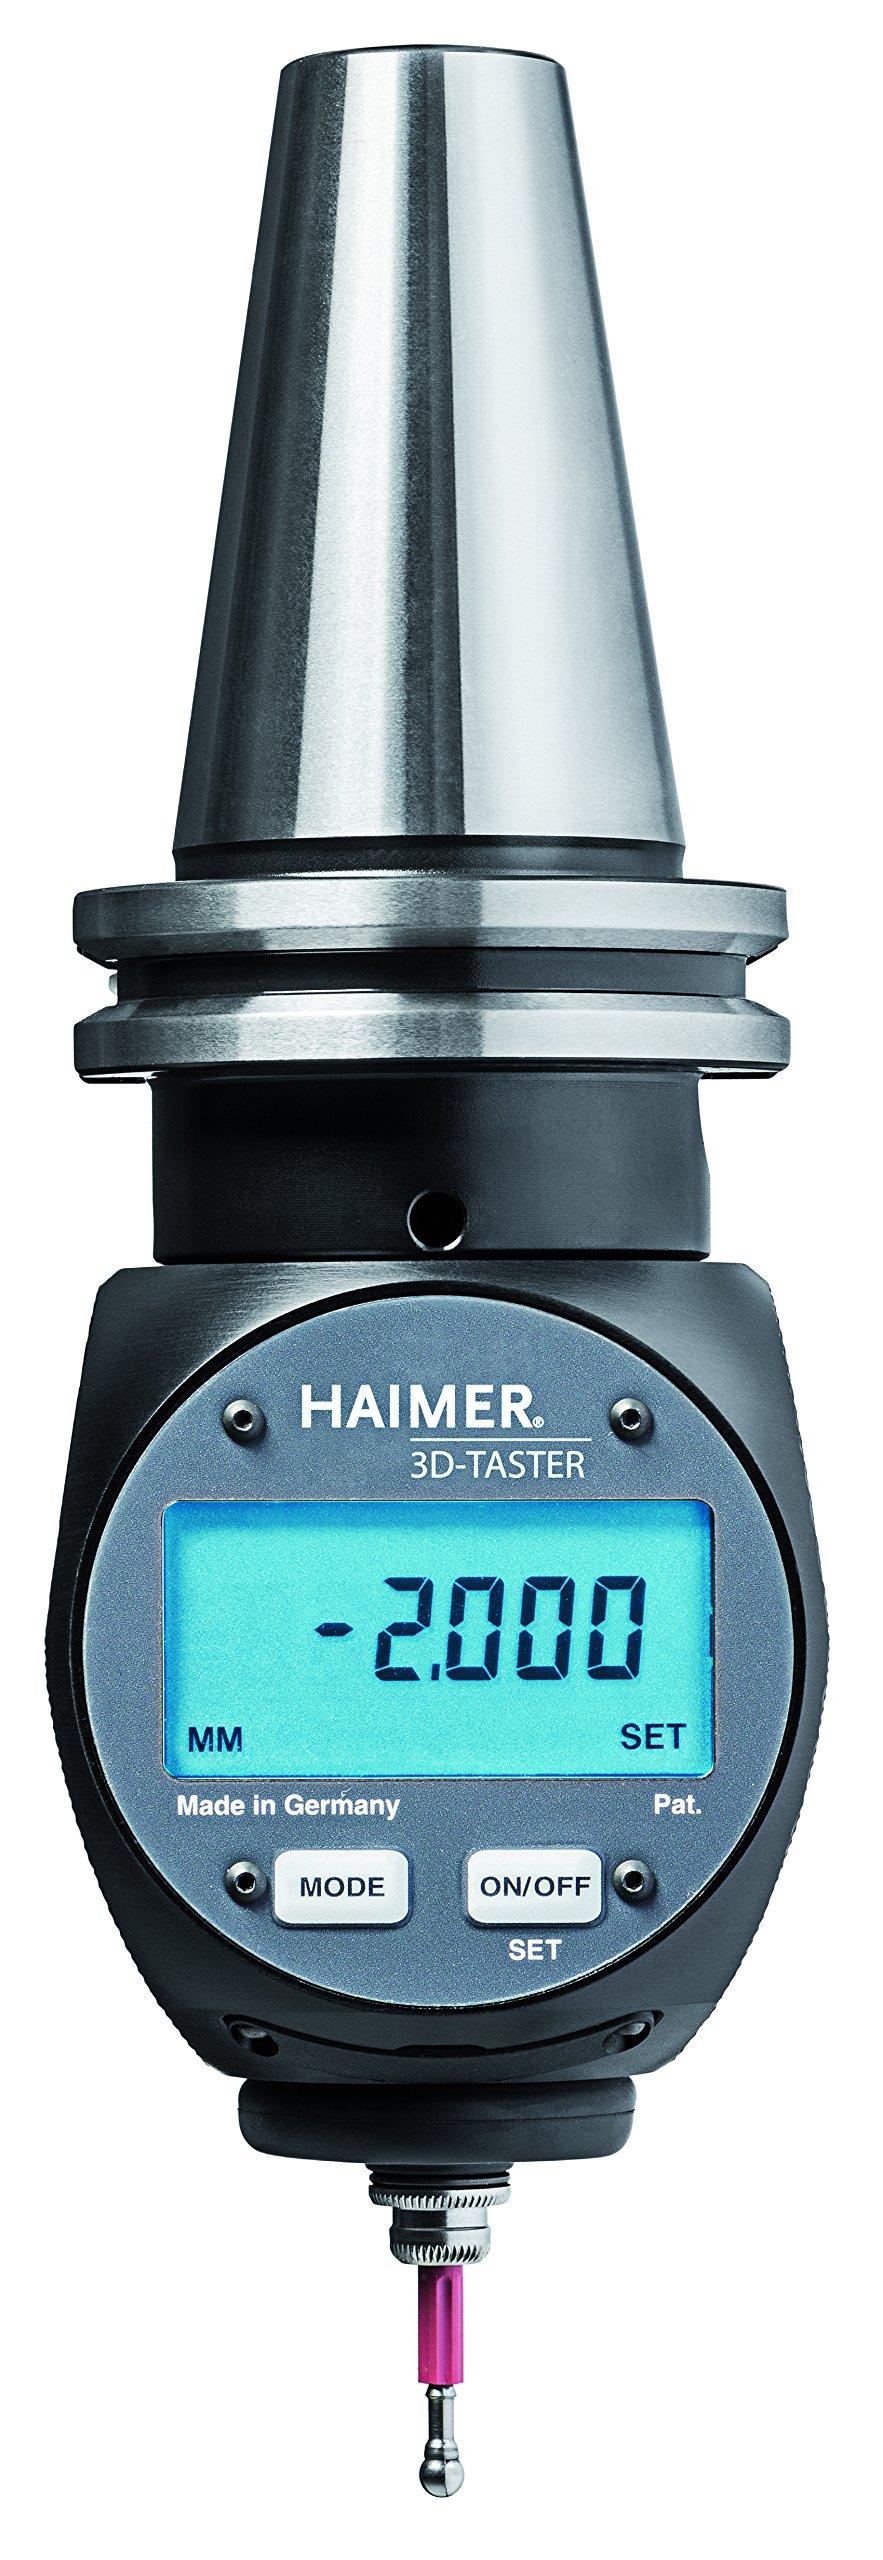 Haimer 80.464.40.FHN Digital 3D-Sensor with Integrated Taper, Neutral Model